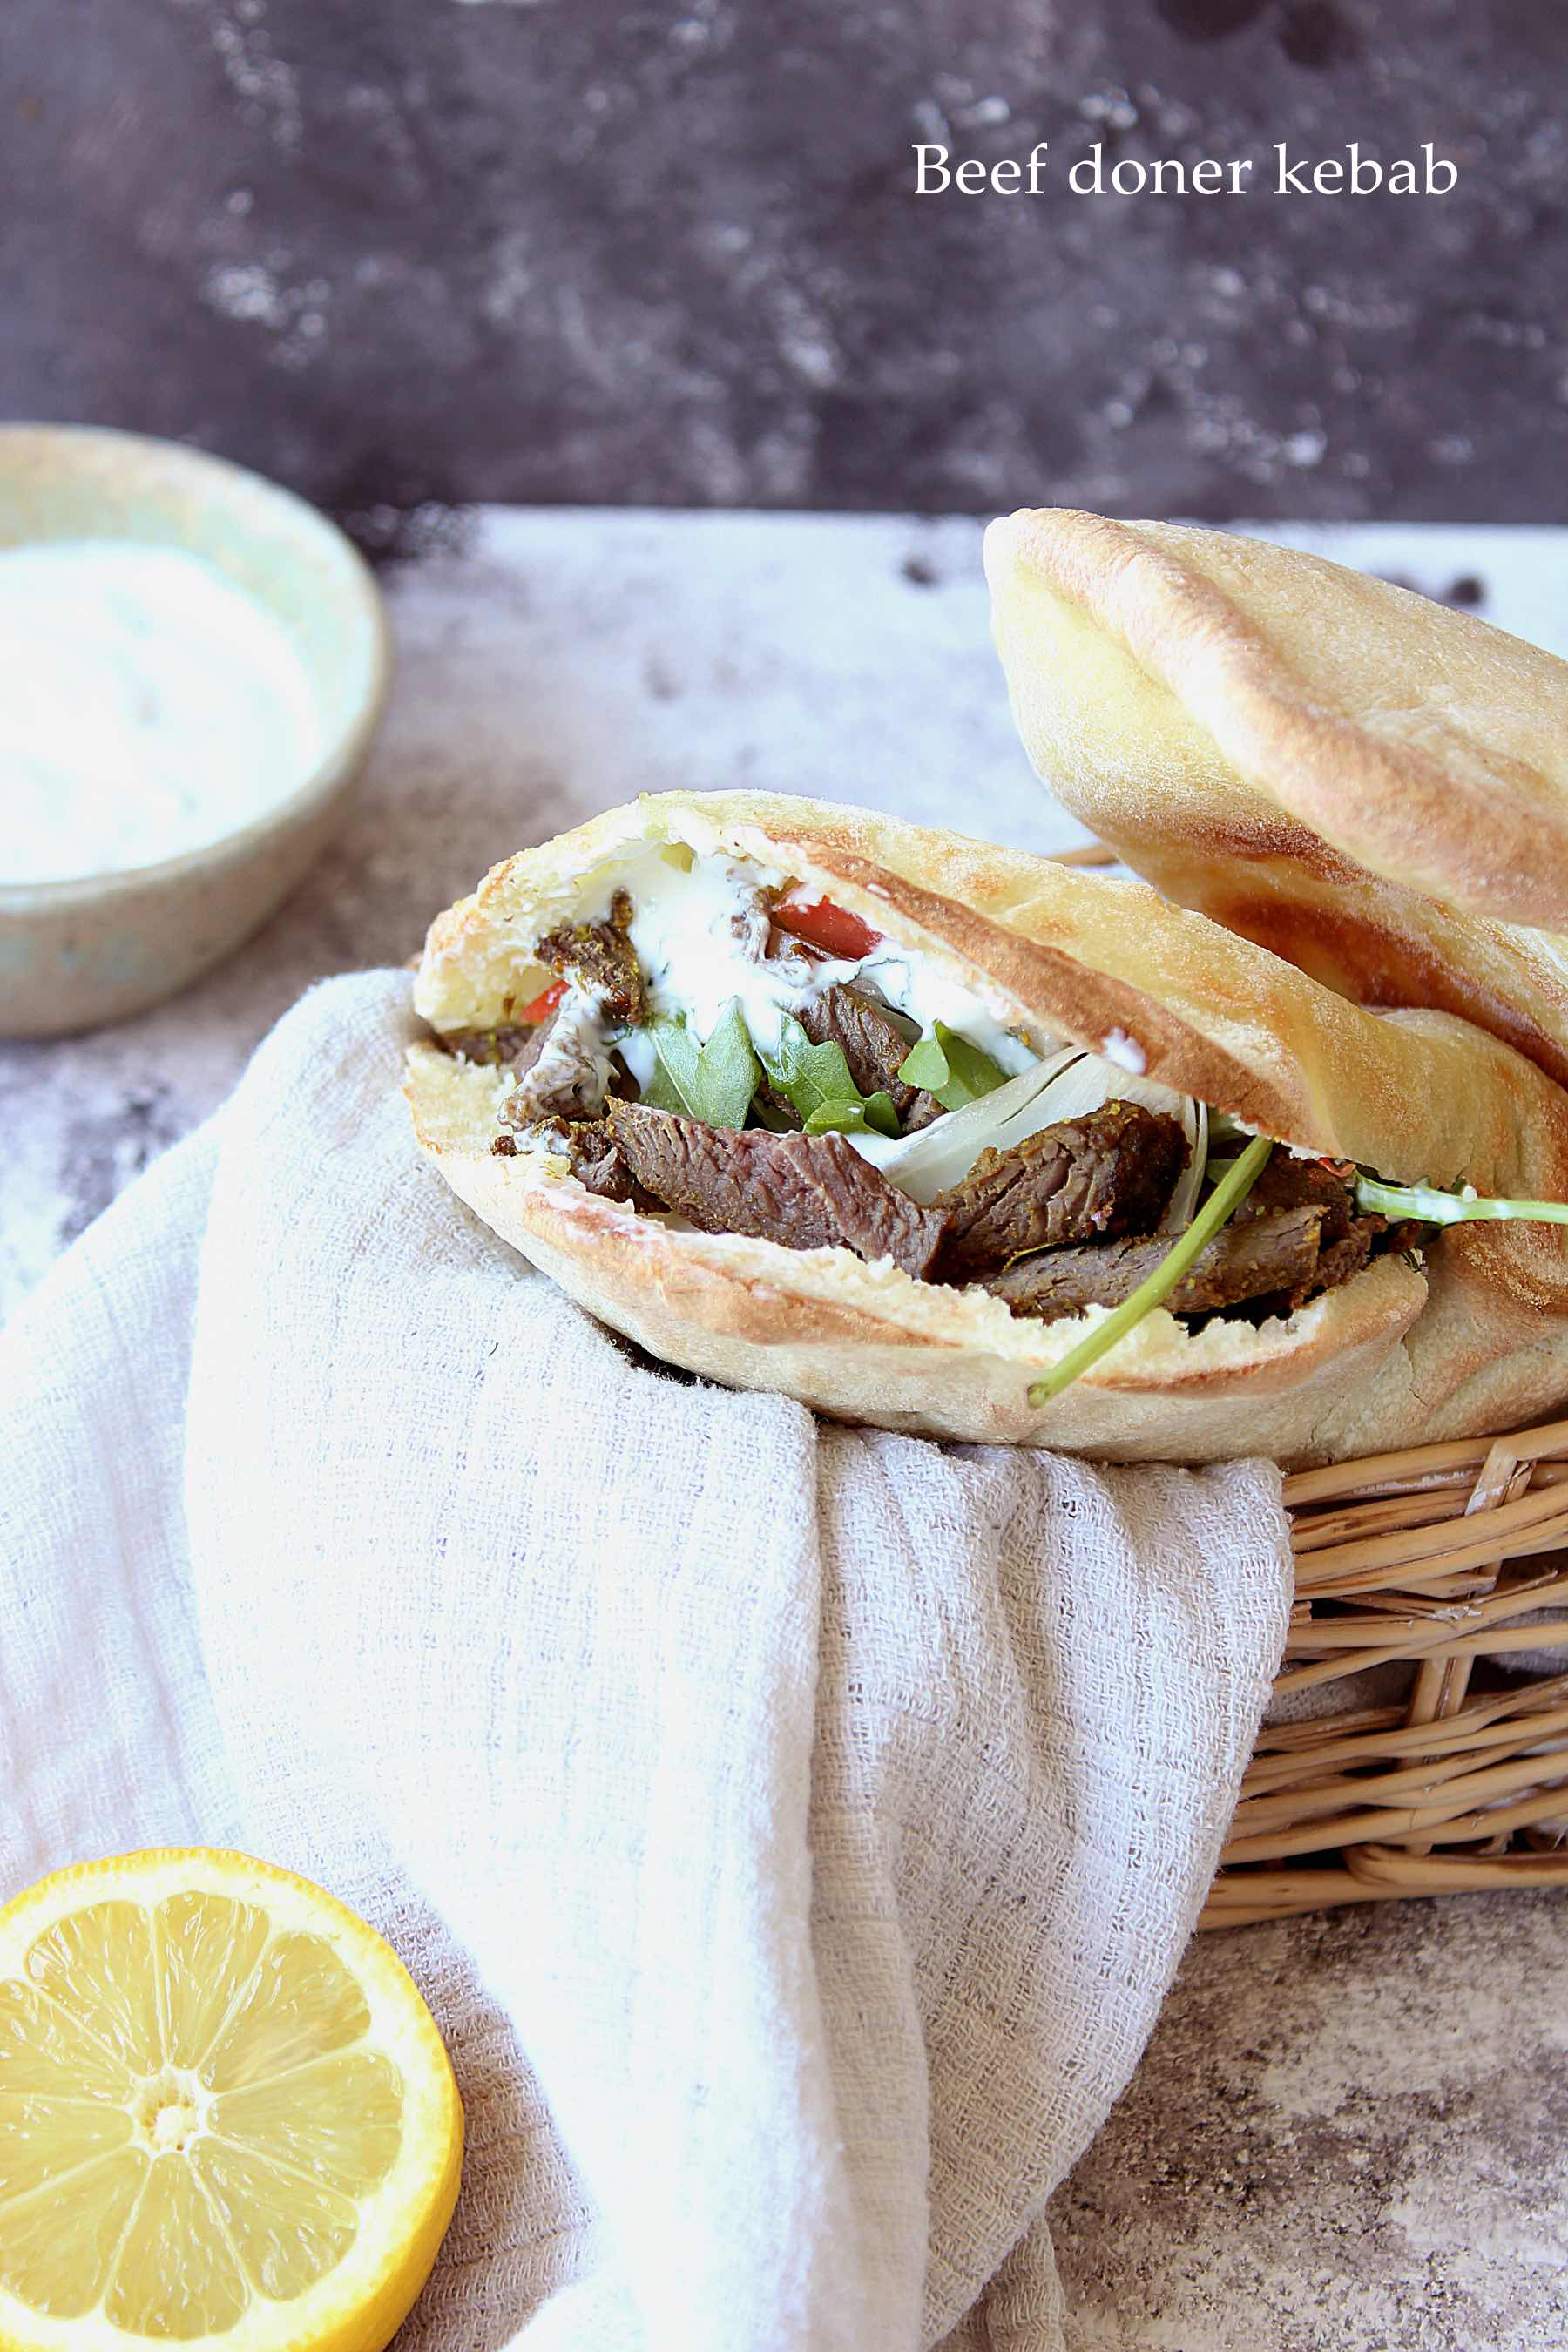 Homemade beef doner kebab